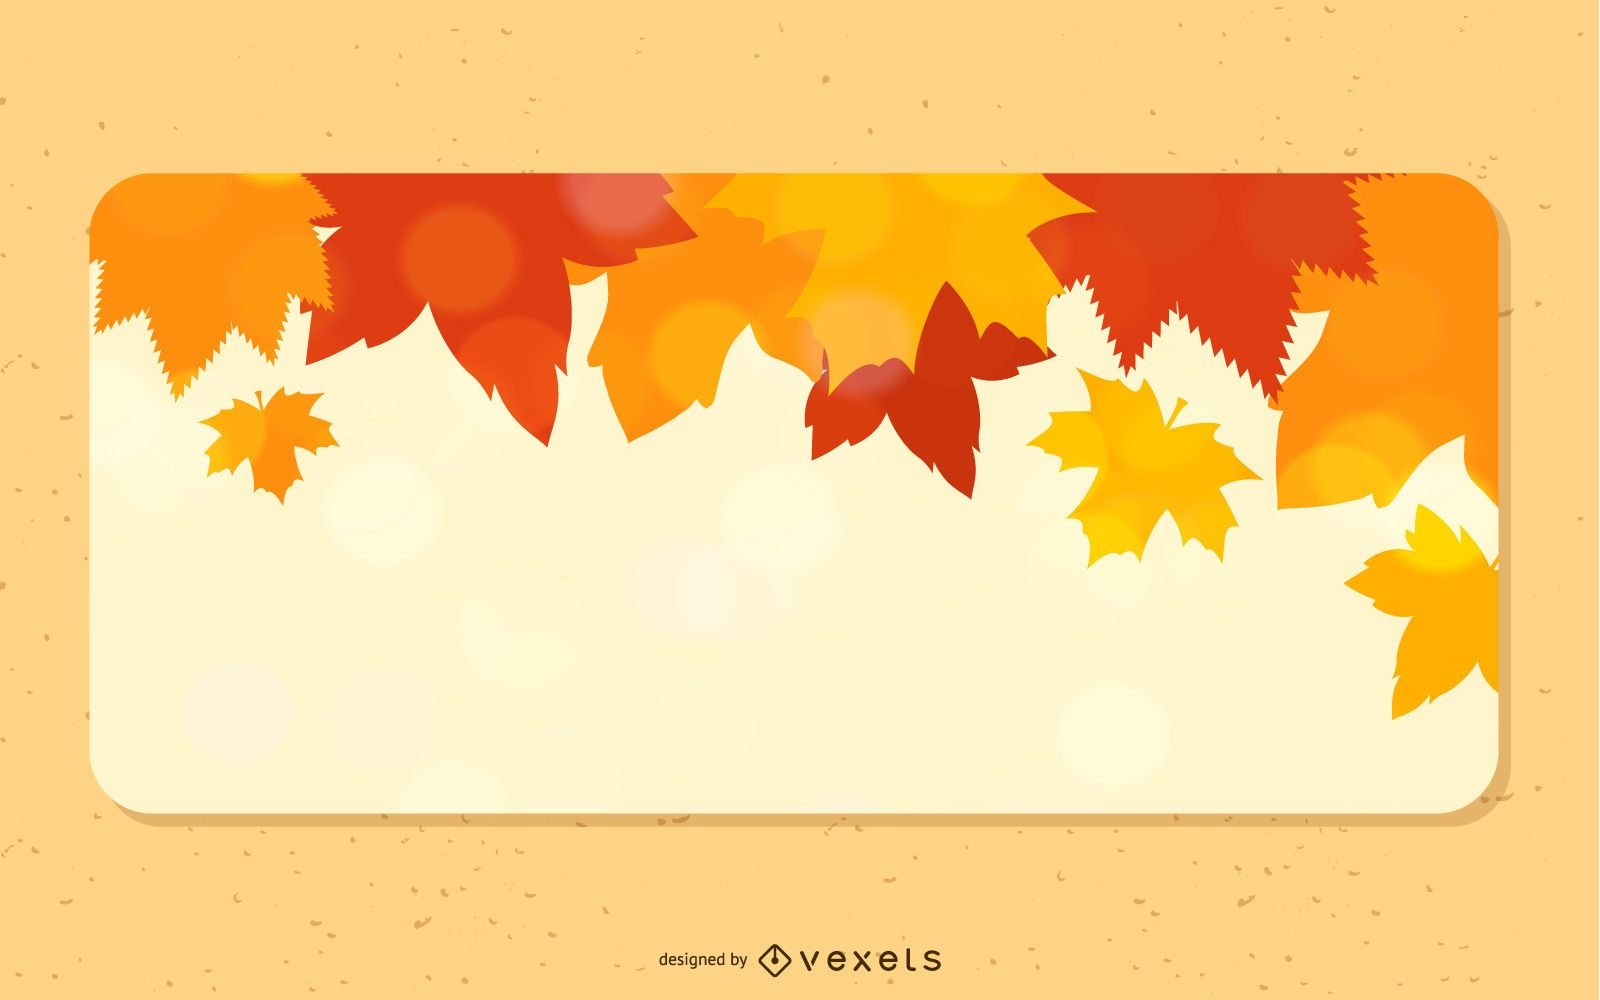 Fallen Autumn Leaves 3 Banners